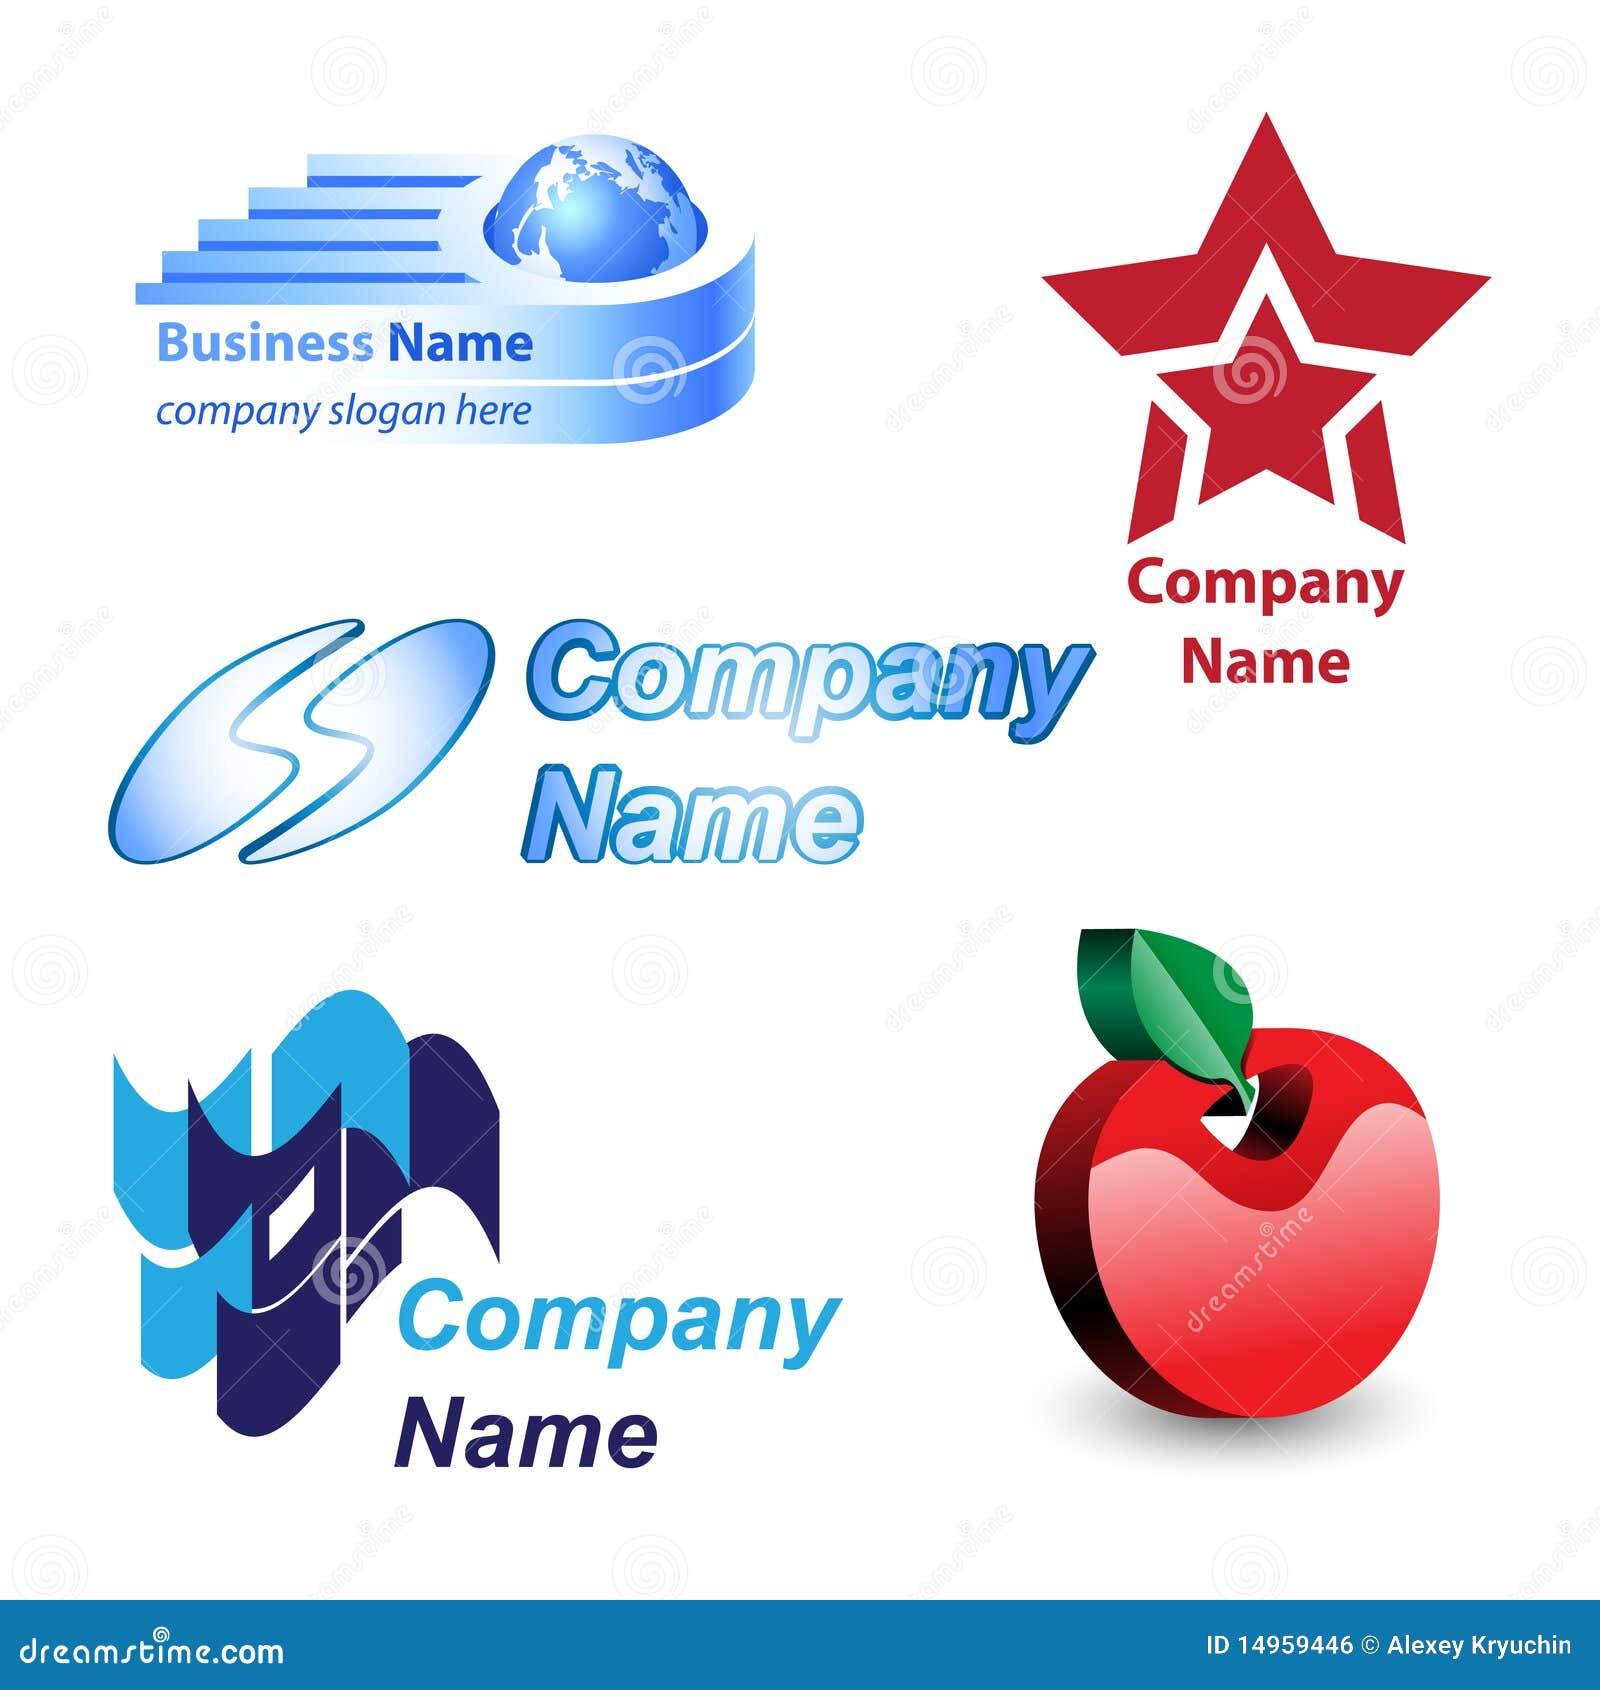 Logo Design Royalty Free Stock Image - Image: 14959446